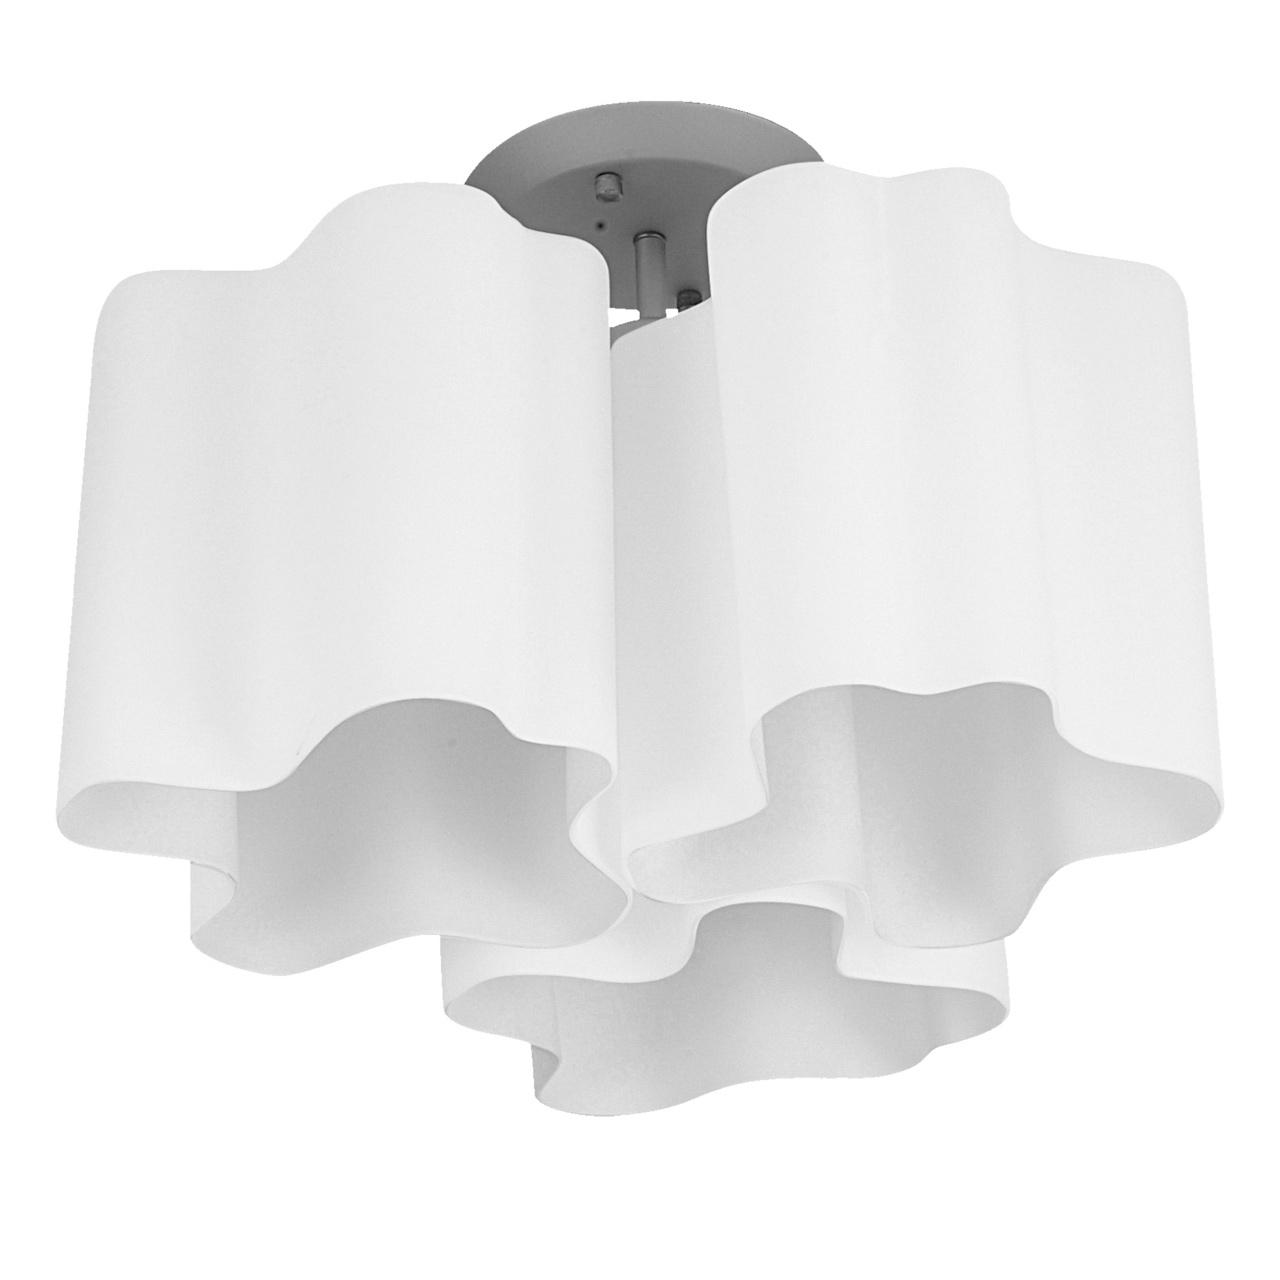 Люстра потолочная Nubi 3х40W E27 хром / белый Lightstar 802030